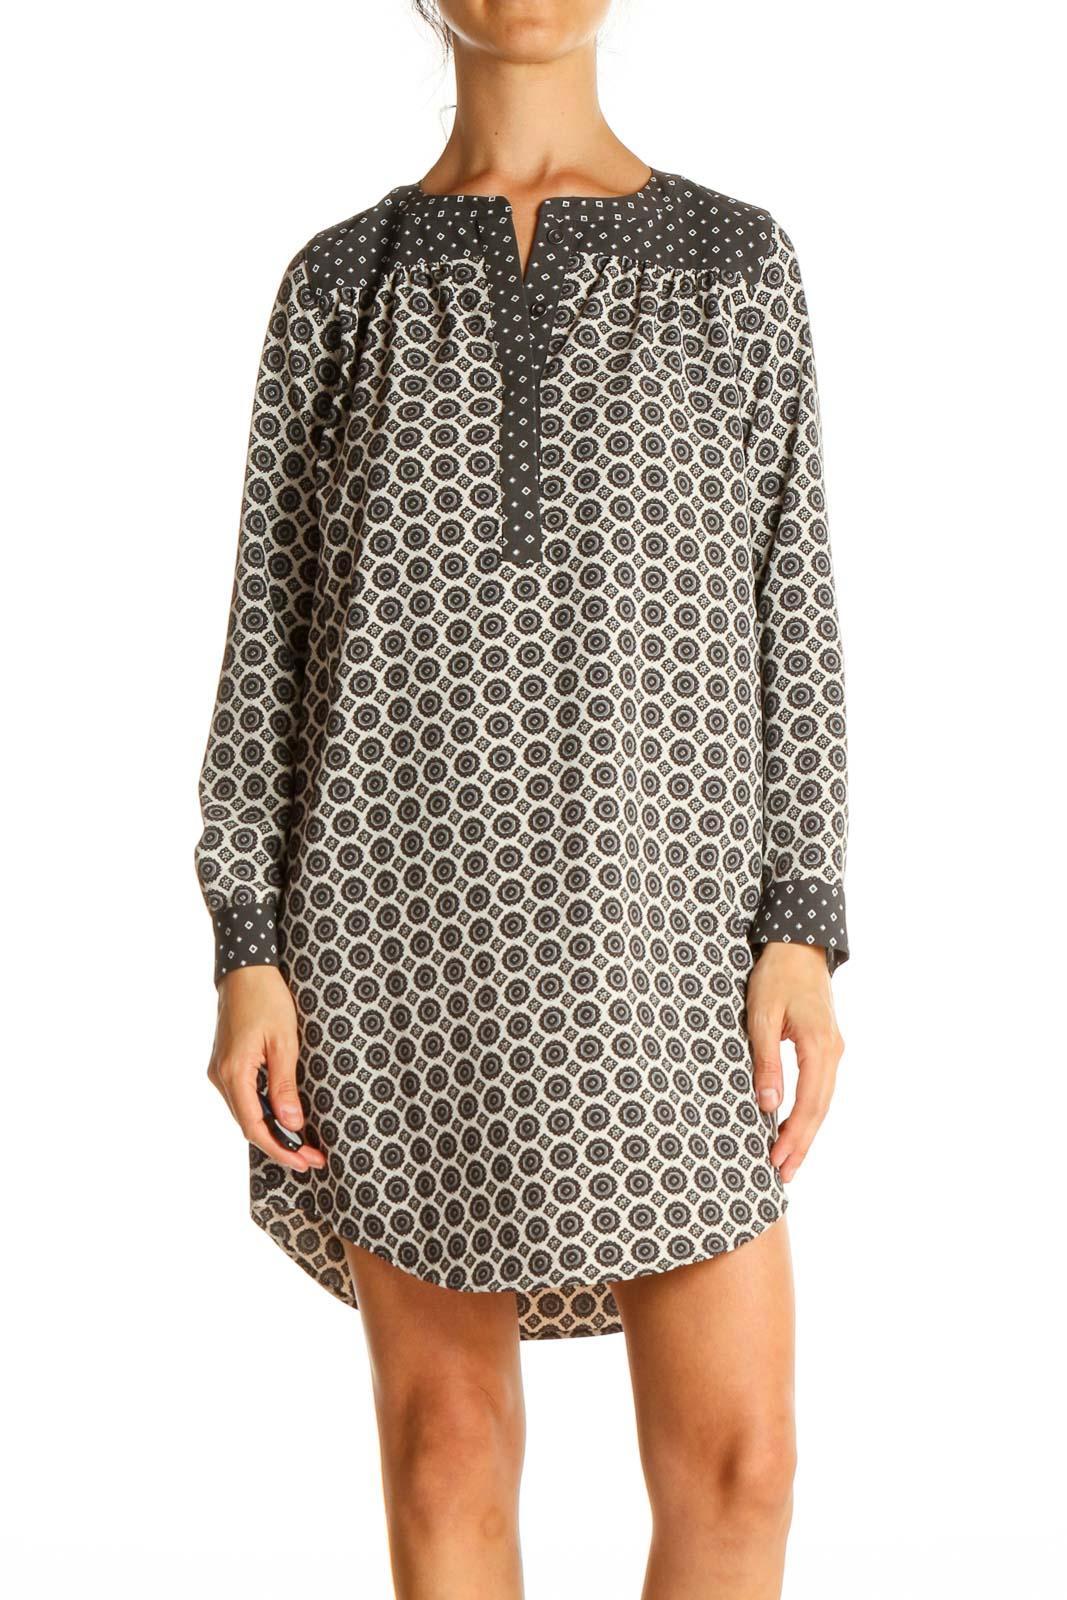 Gray Geometric Print Shift Dress Front